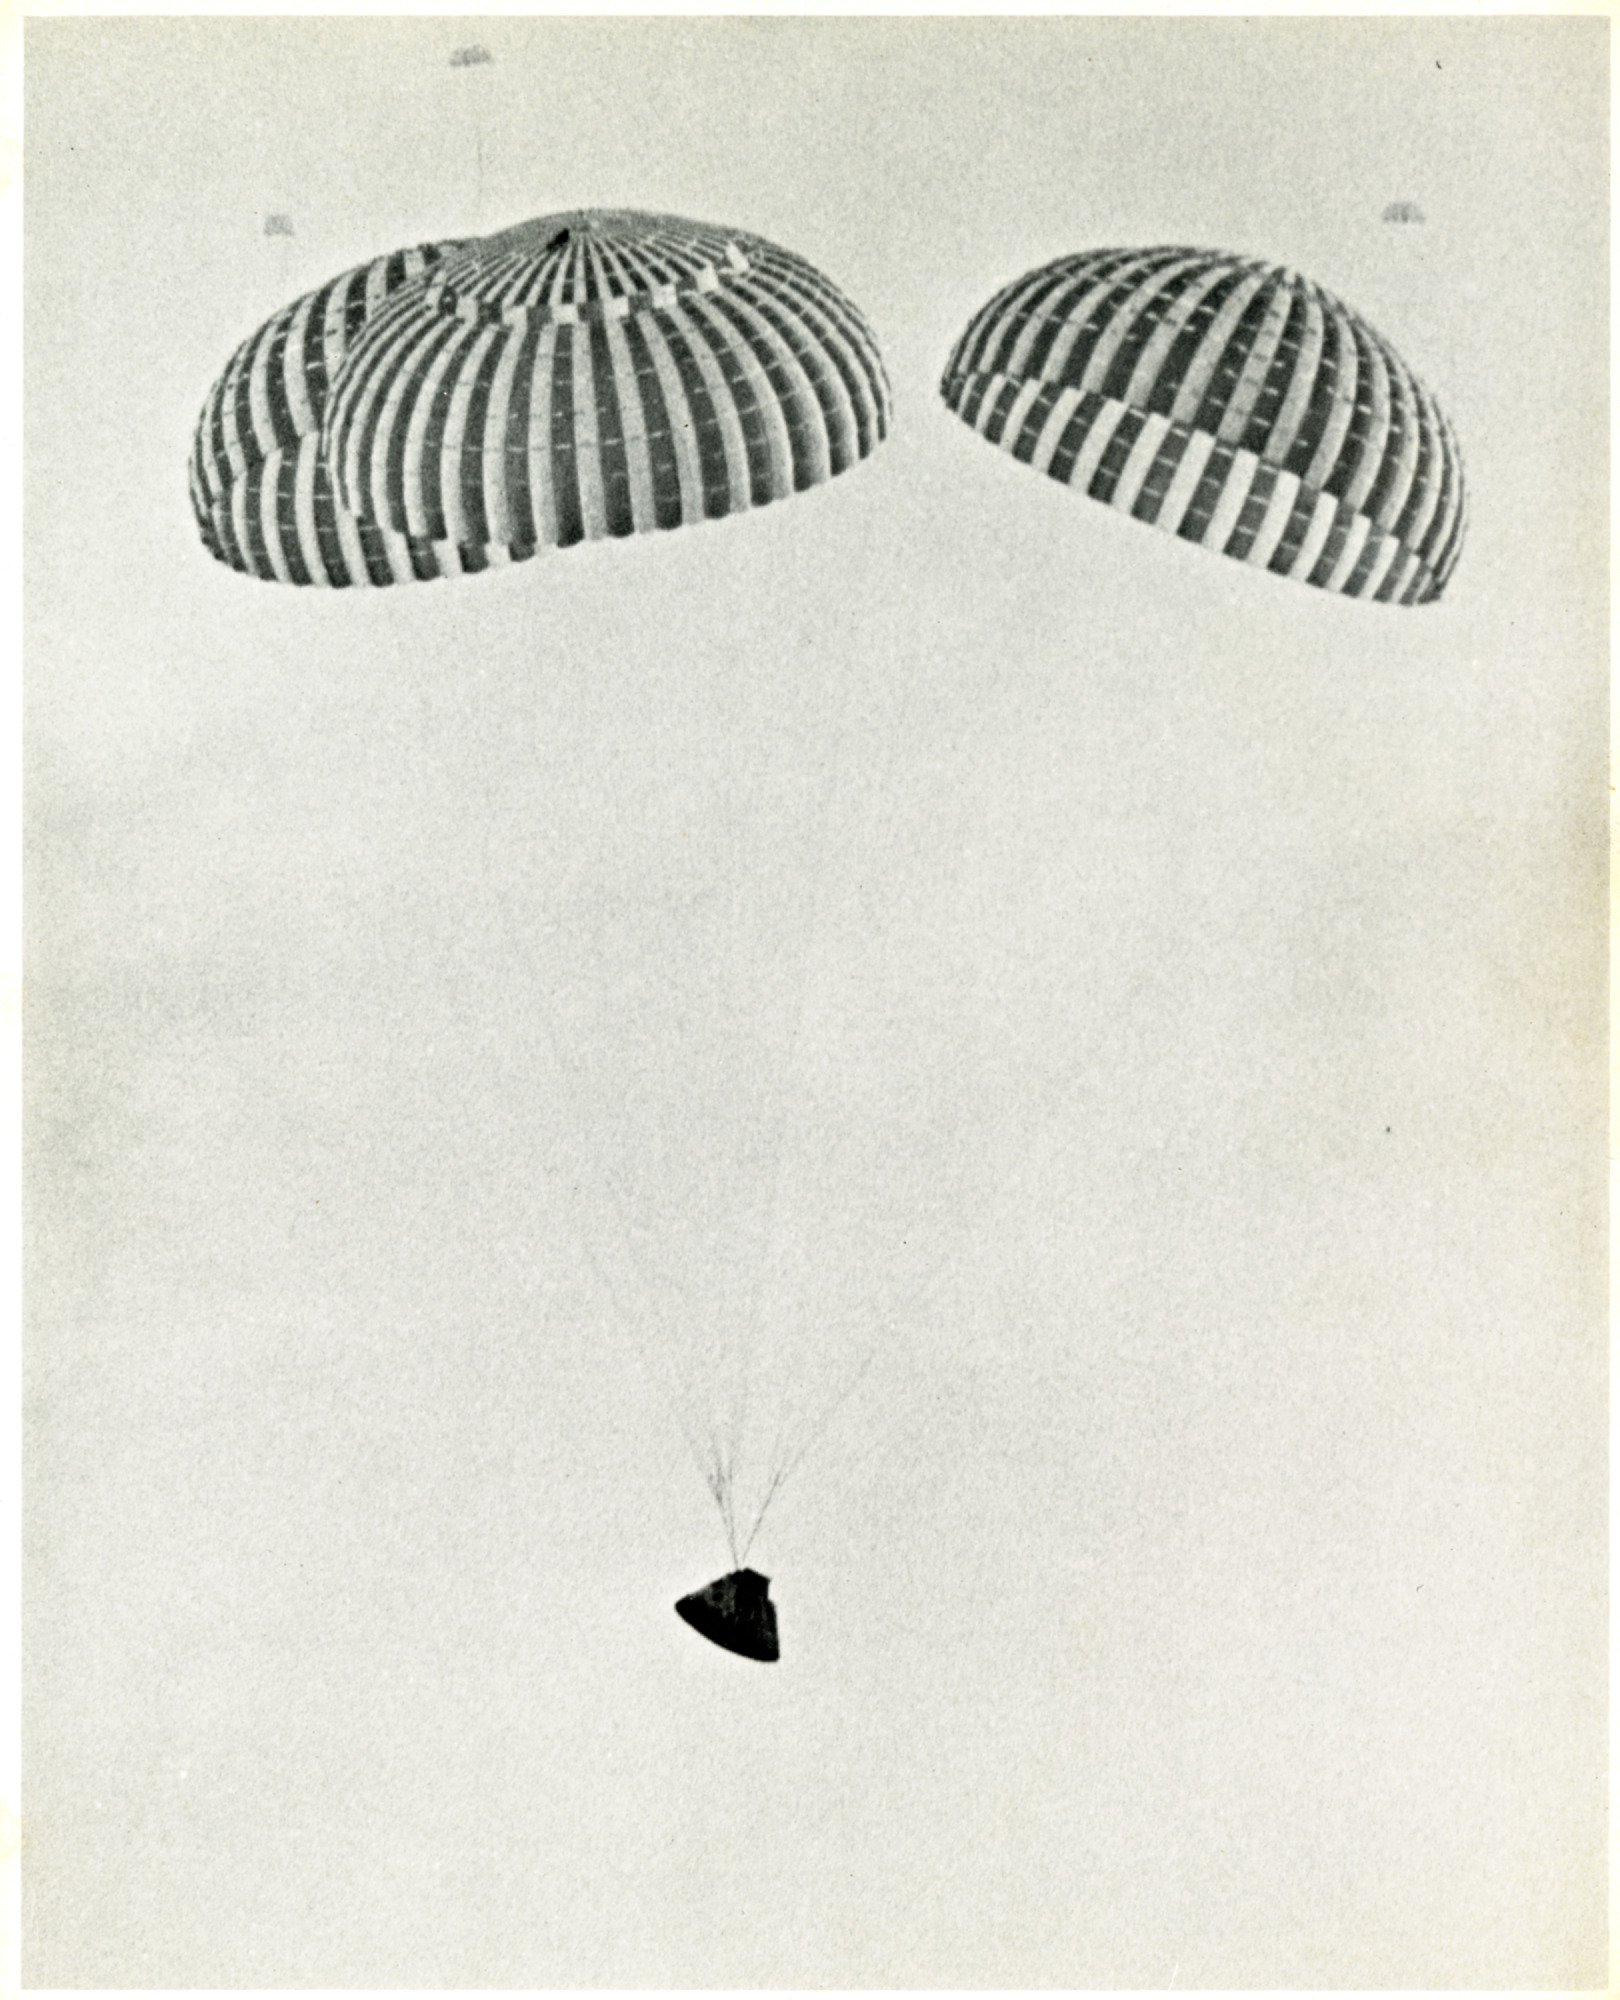 Apollo 13 Flight Recovery Images Lundgren